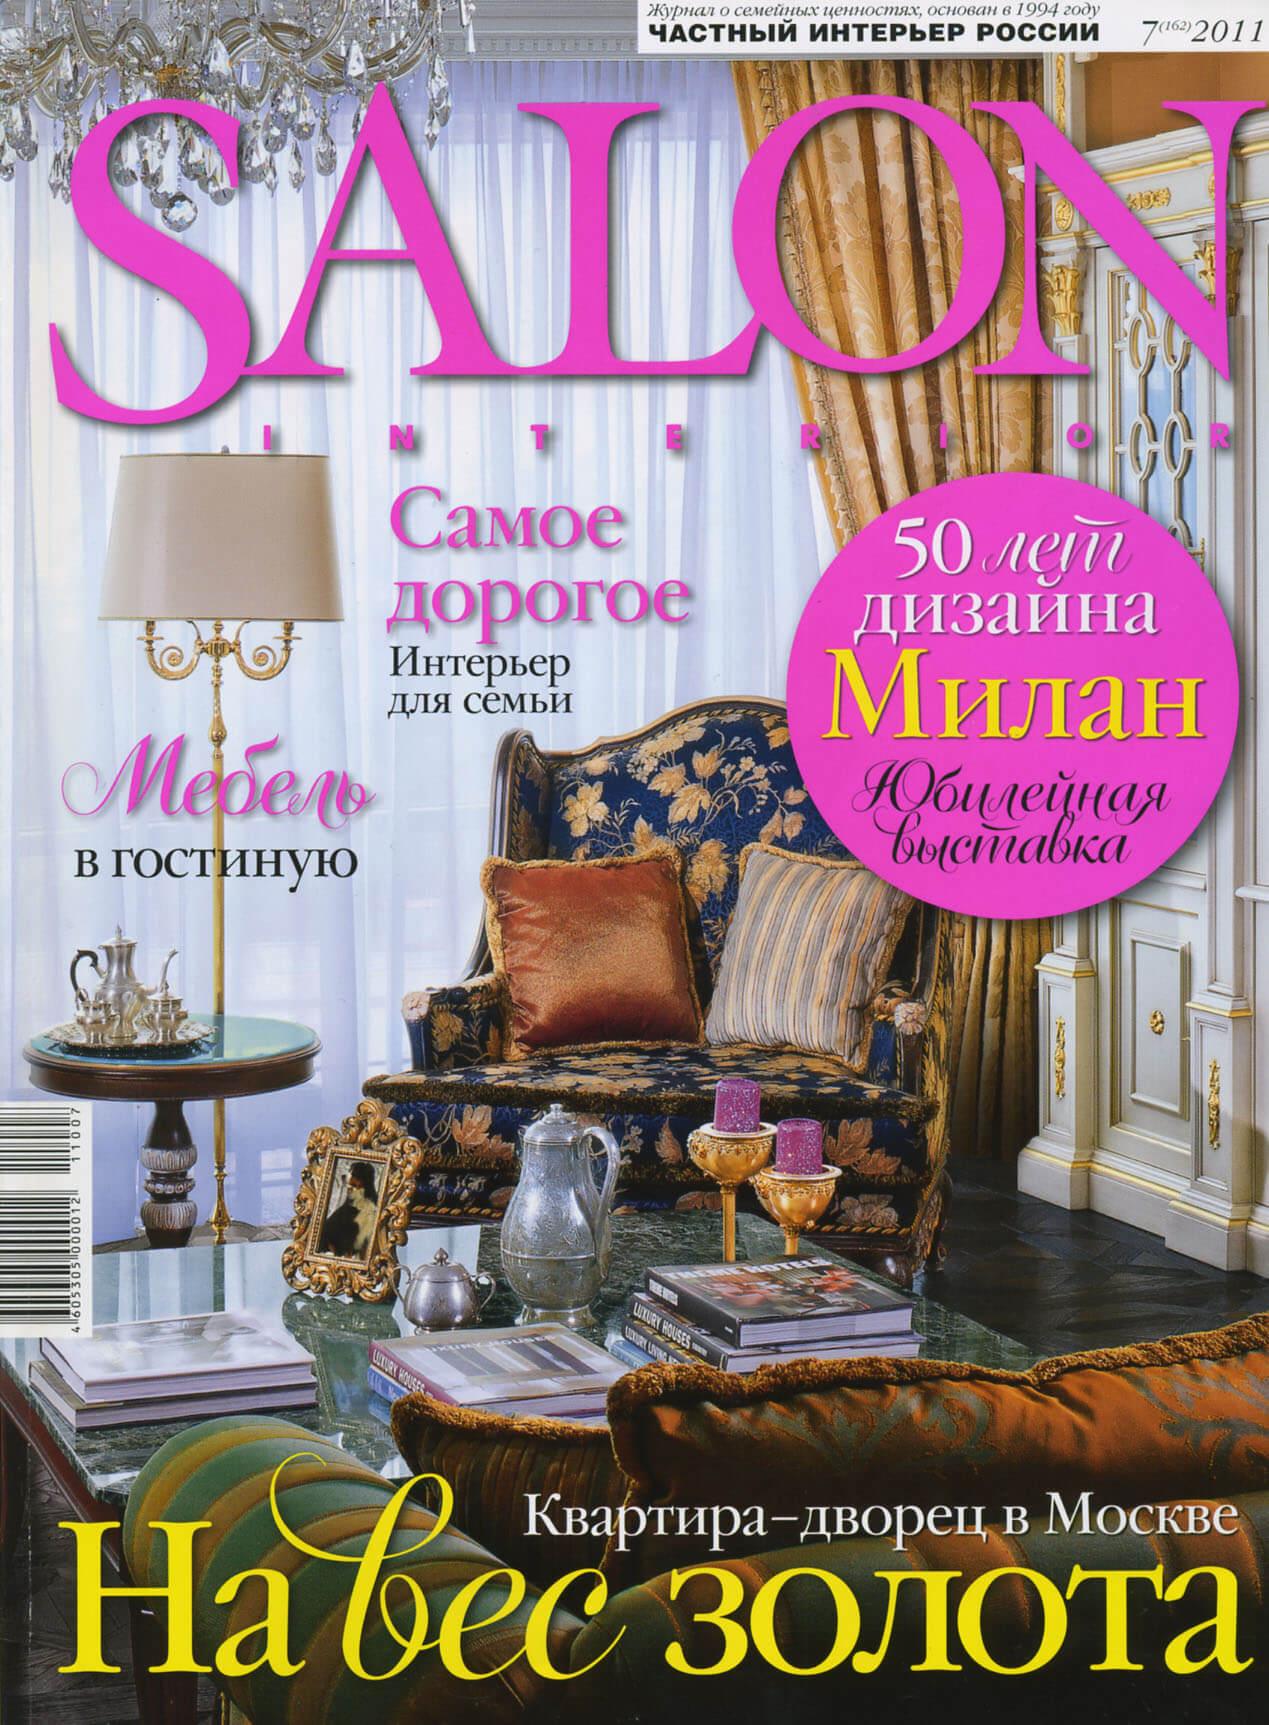 Salon 7 (162) 2011